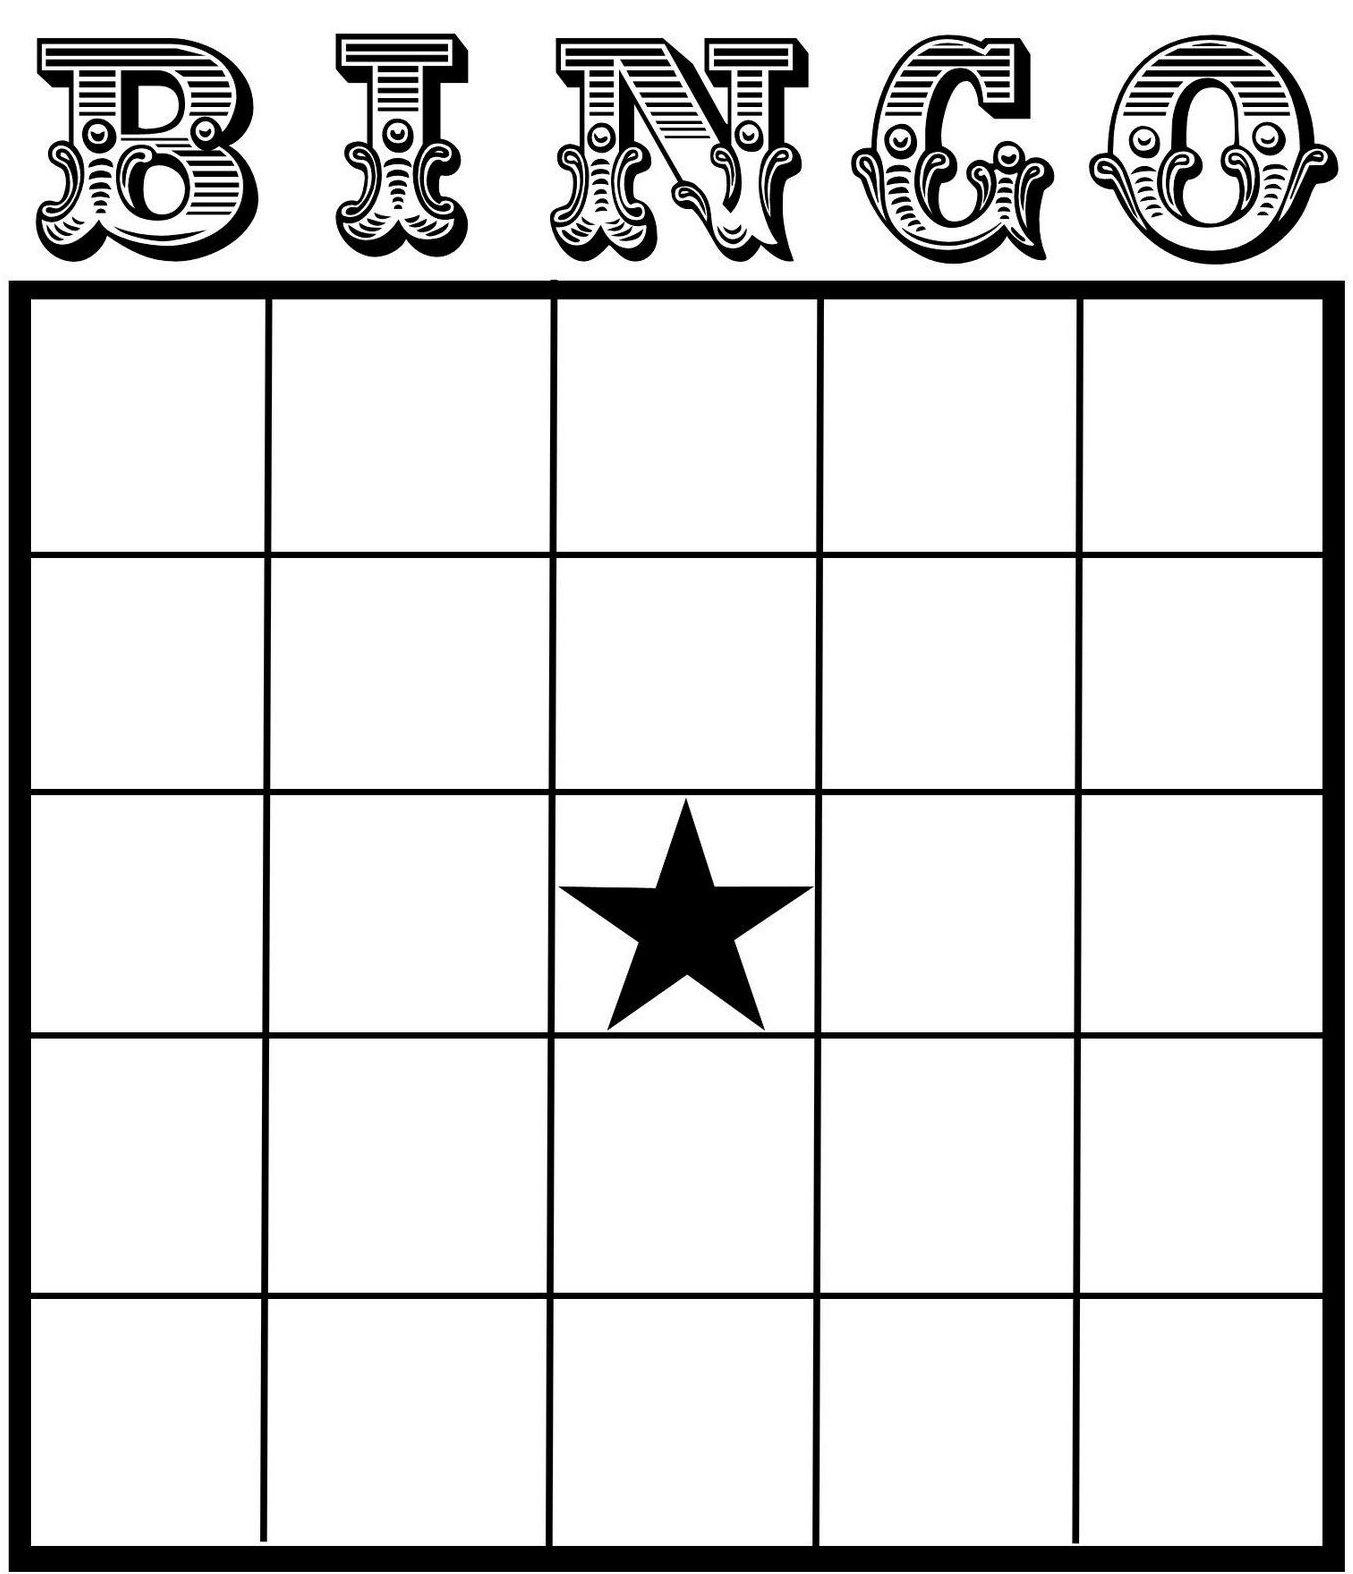 002 Blank Bingo Card Template Ideas Stupendous Free Templates - Free Printable Bingo Cards For Teachers